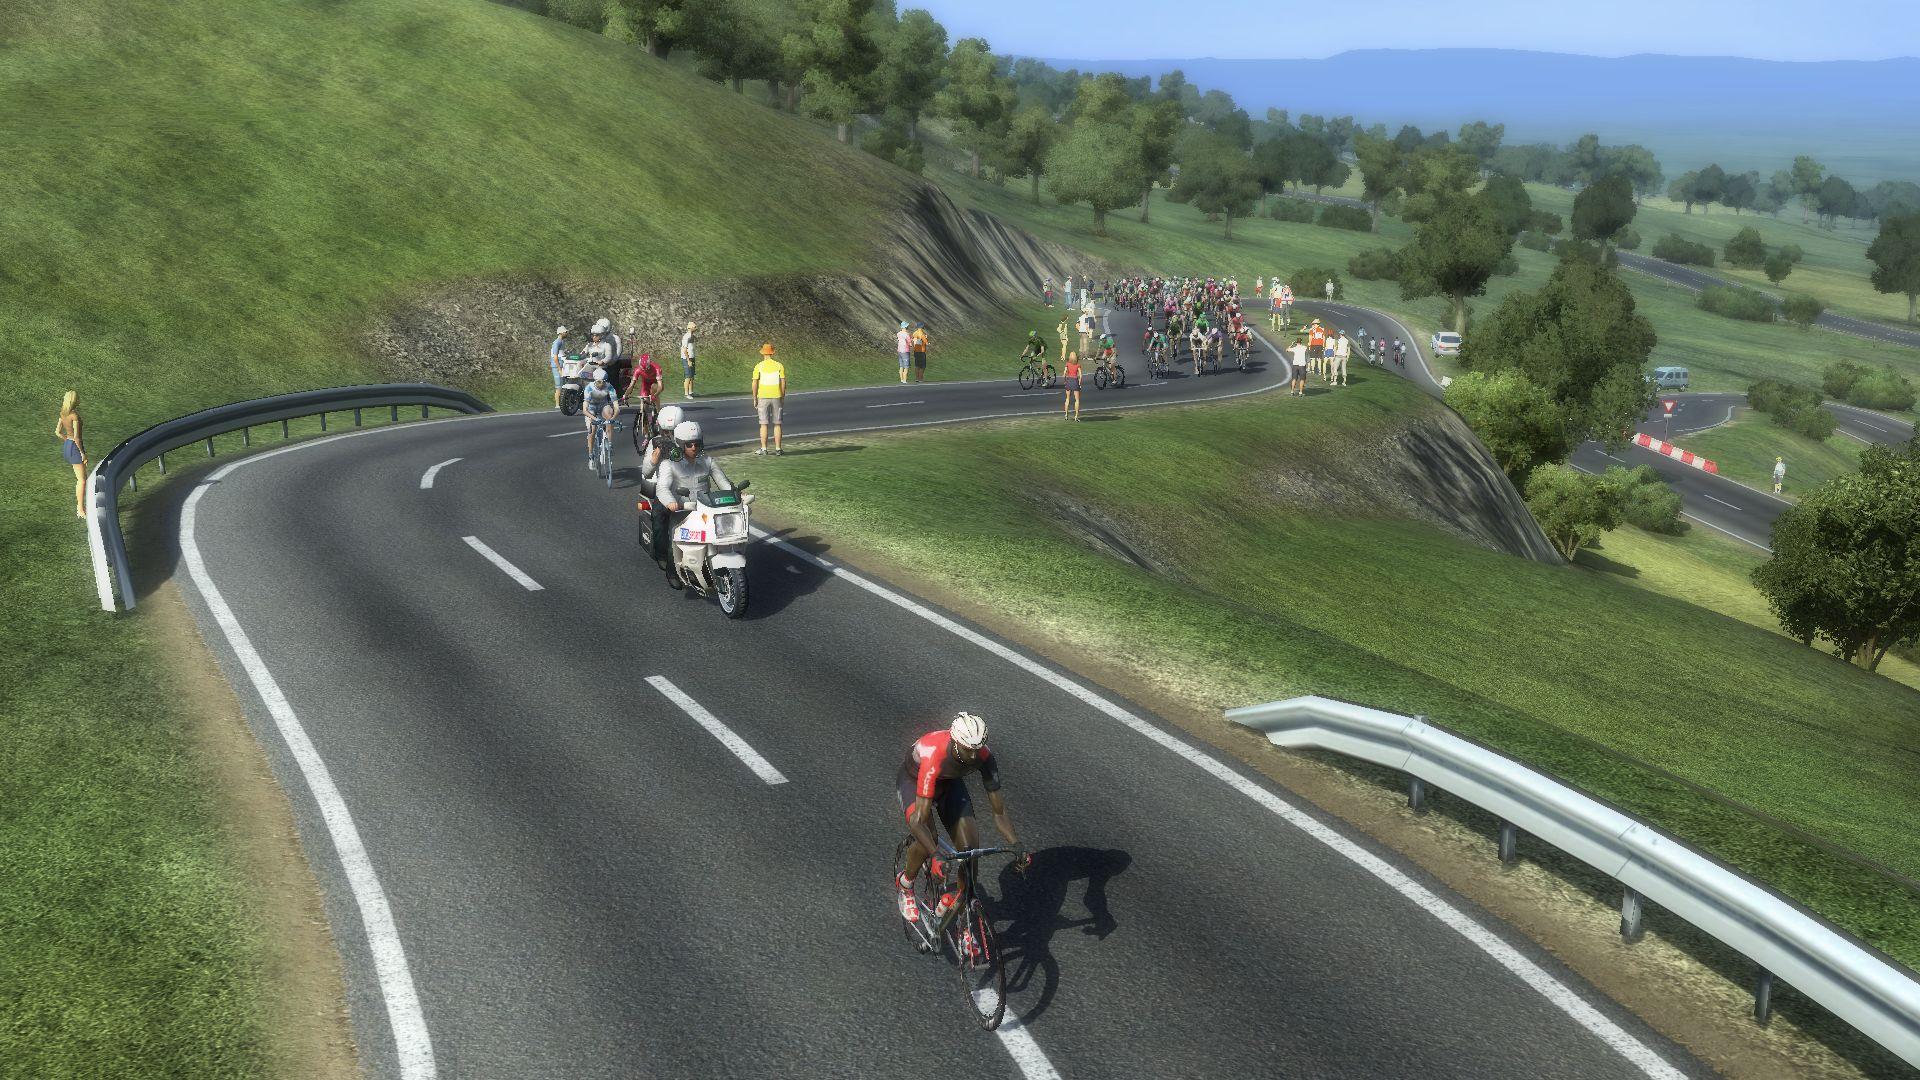 pcmdaily.com/images/mg/2018/Races/C2HC/Zuri/Zuri%2012.jpg